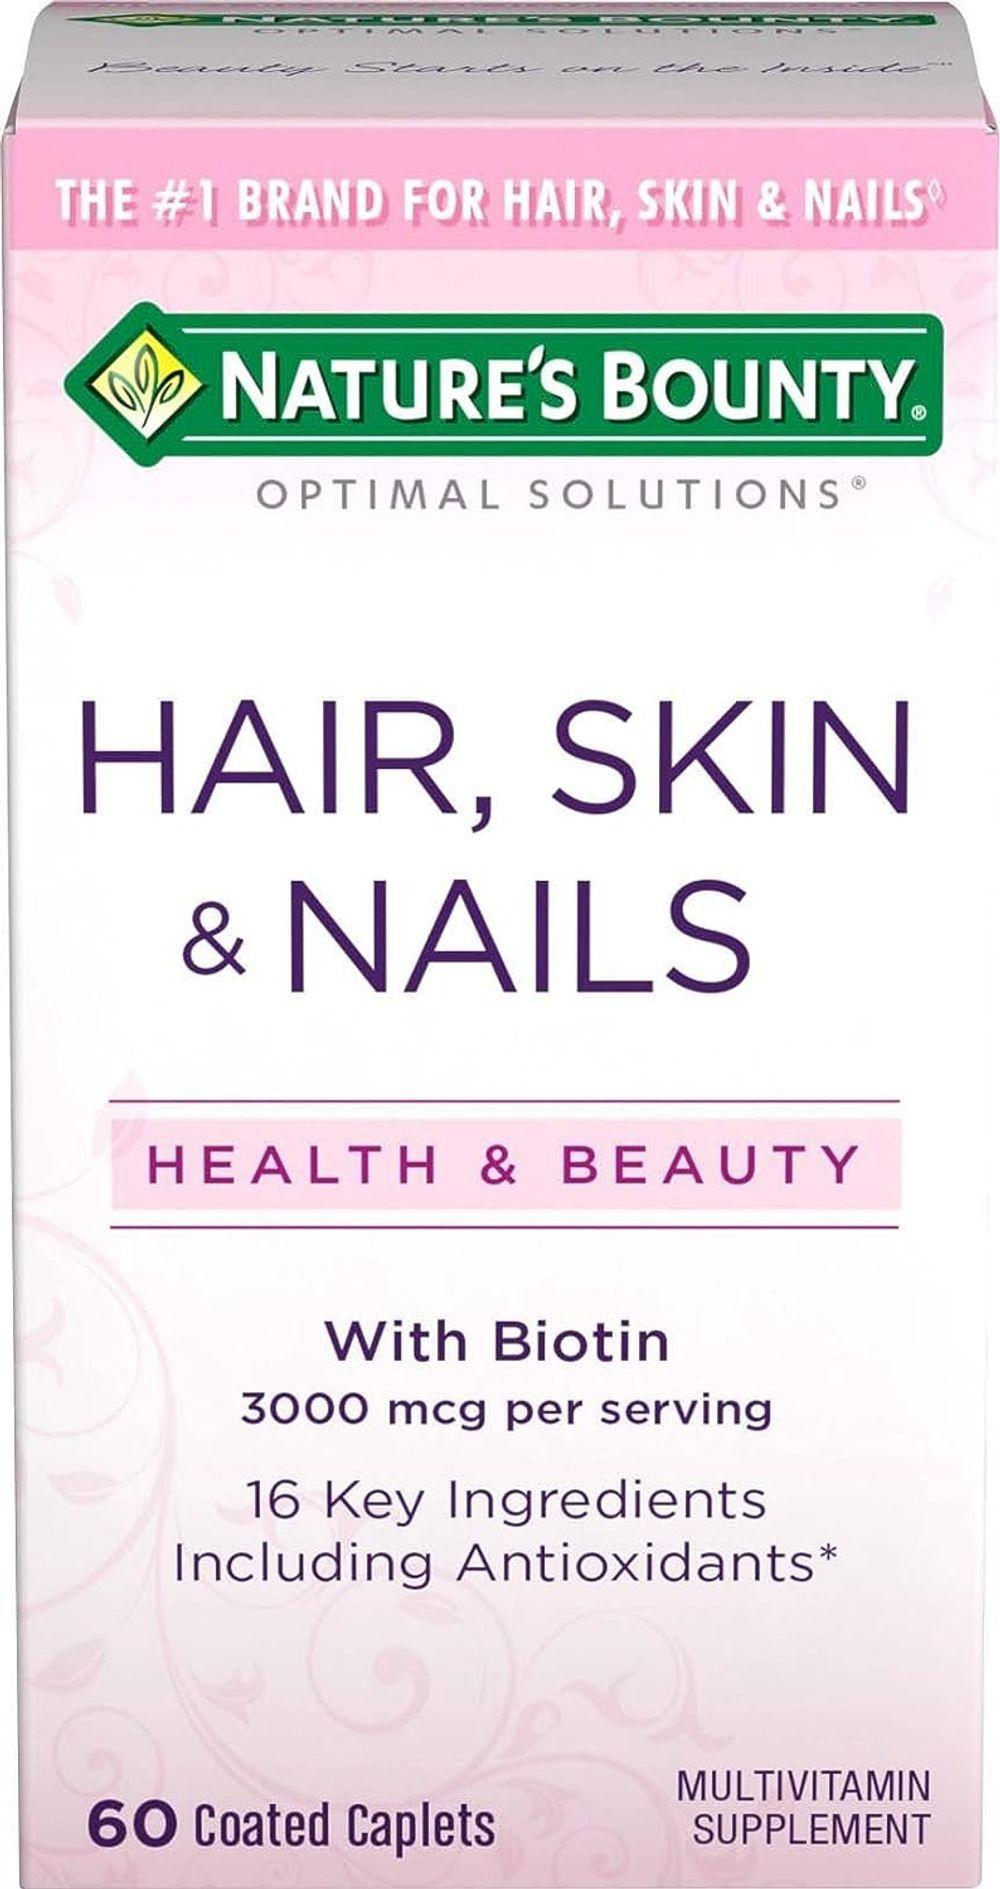 Nature's Bounty Optimal Solutions Hair, Skin & Nails Formula, 60 Coated Caplets